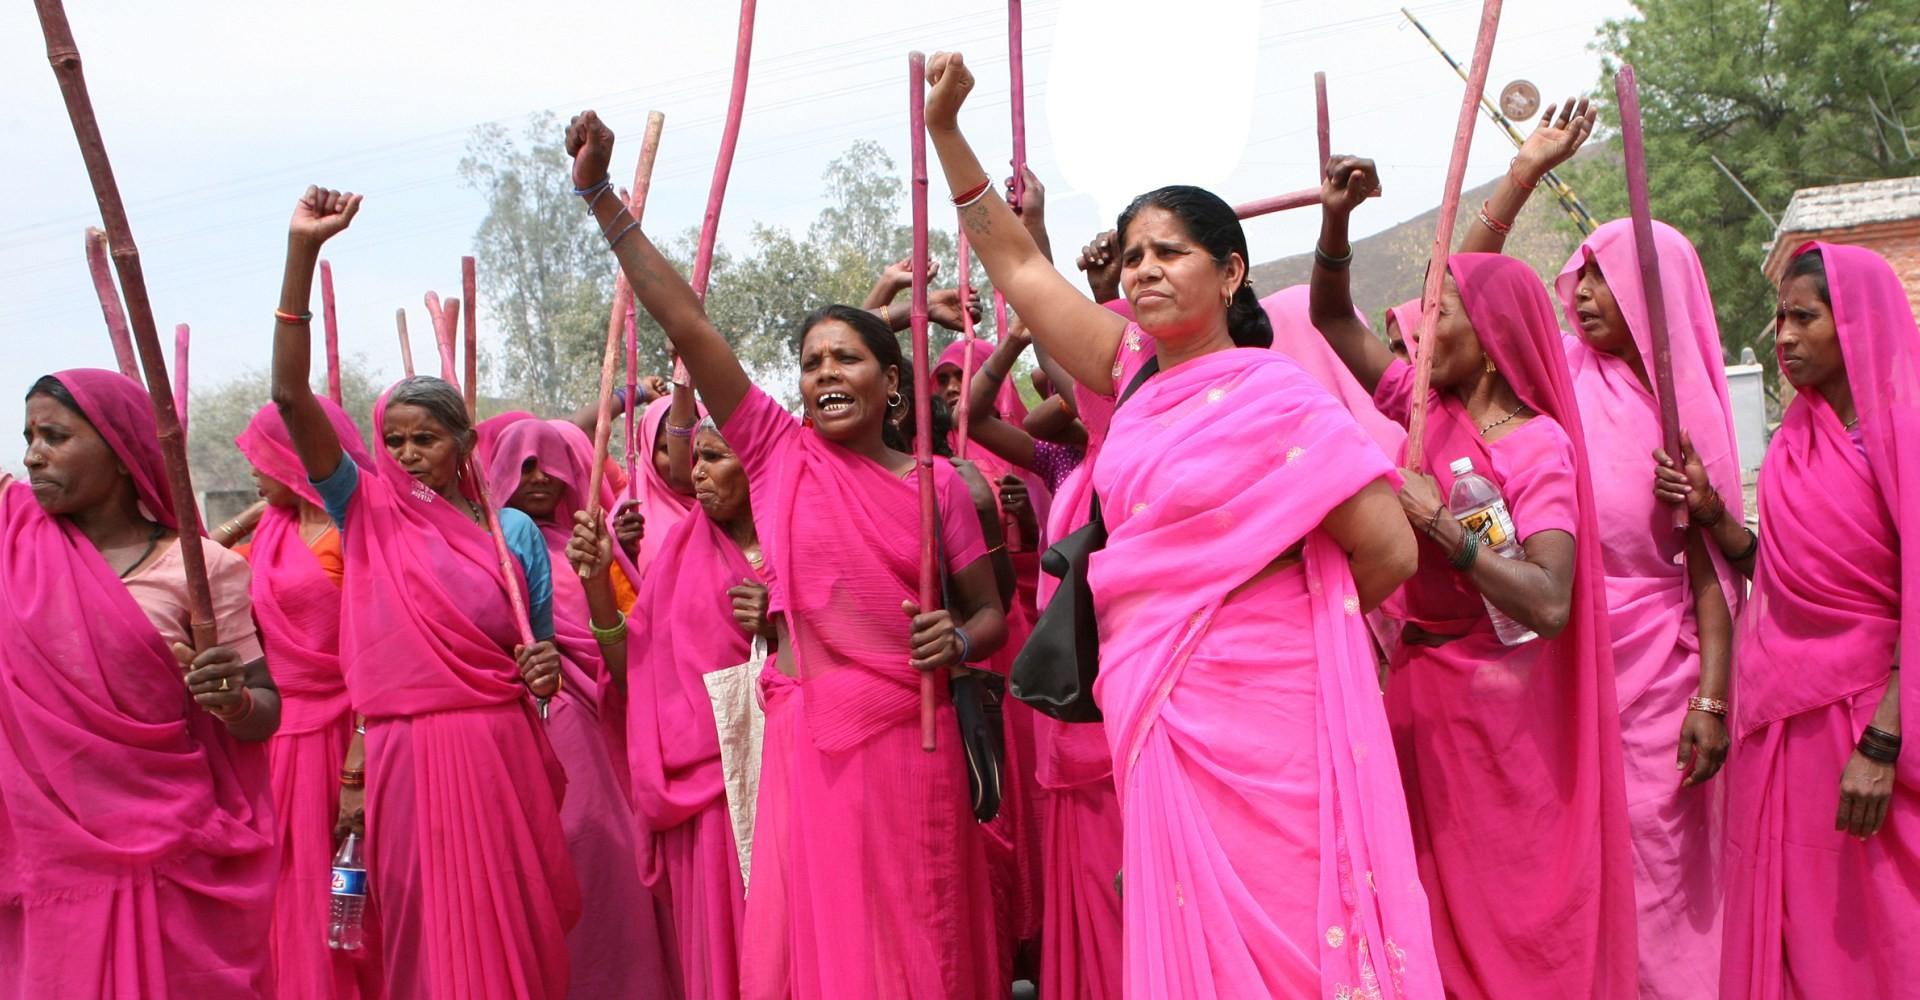 Photo: Madhumitha Srinivasan via The Hindu